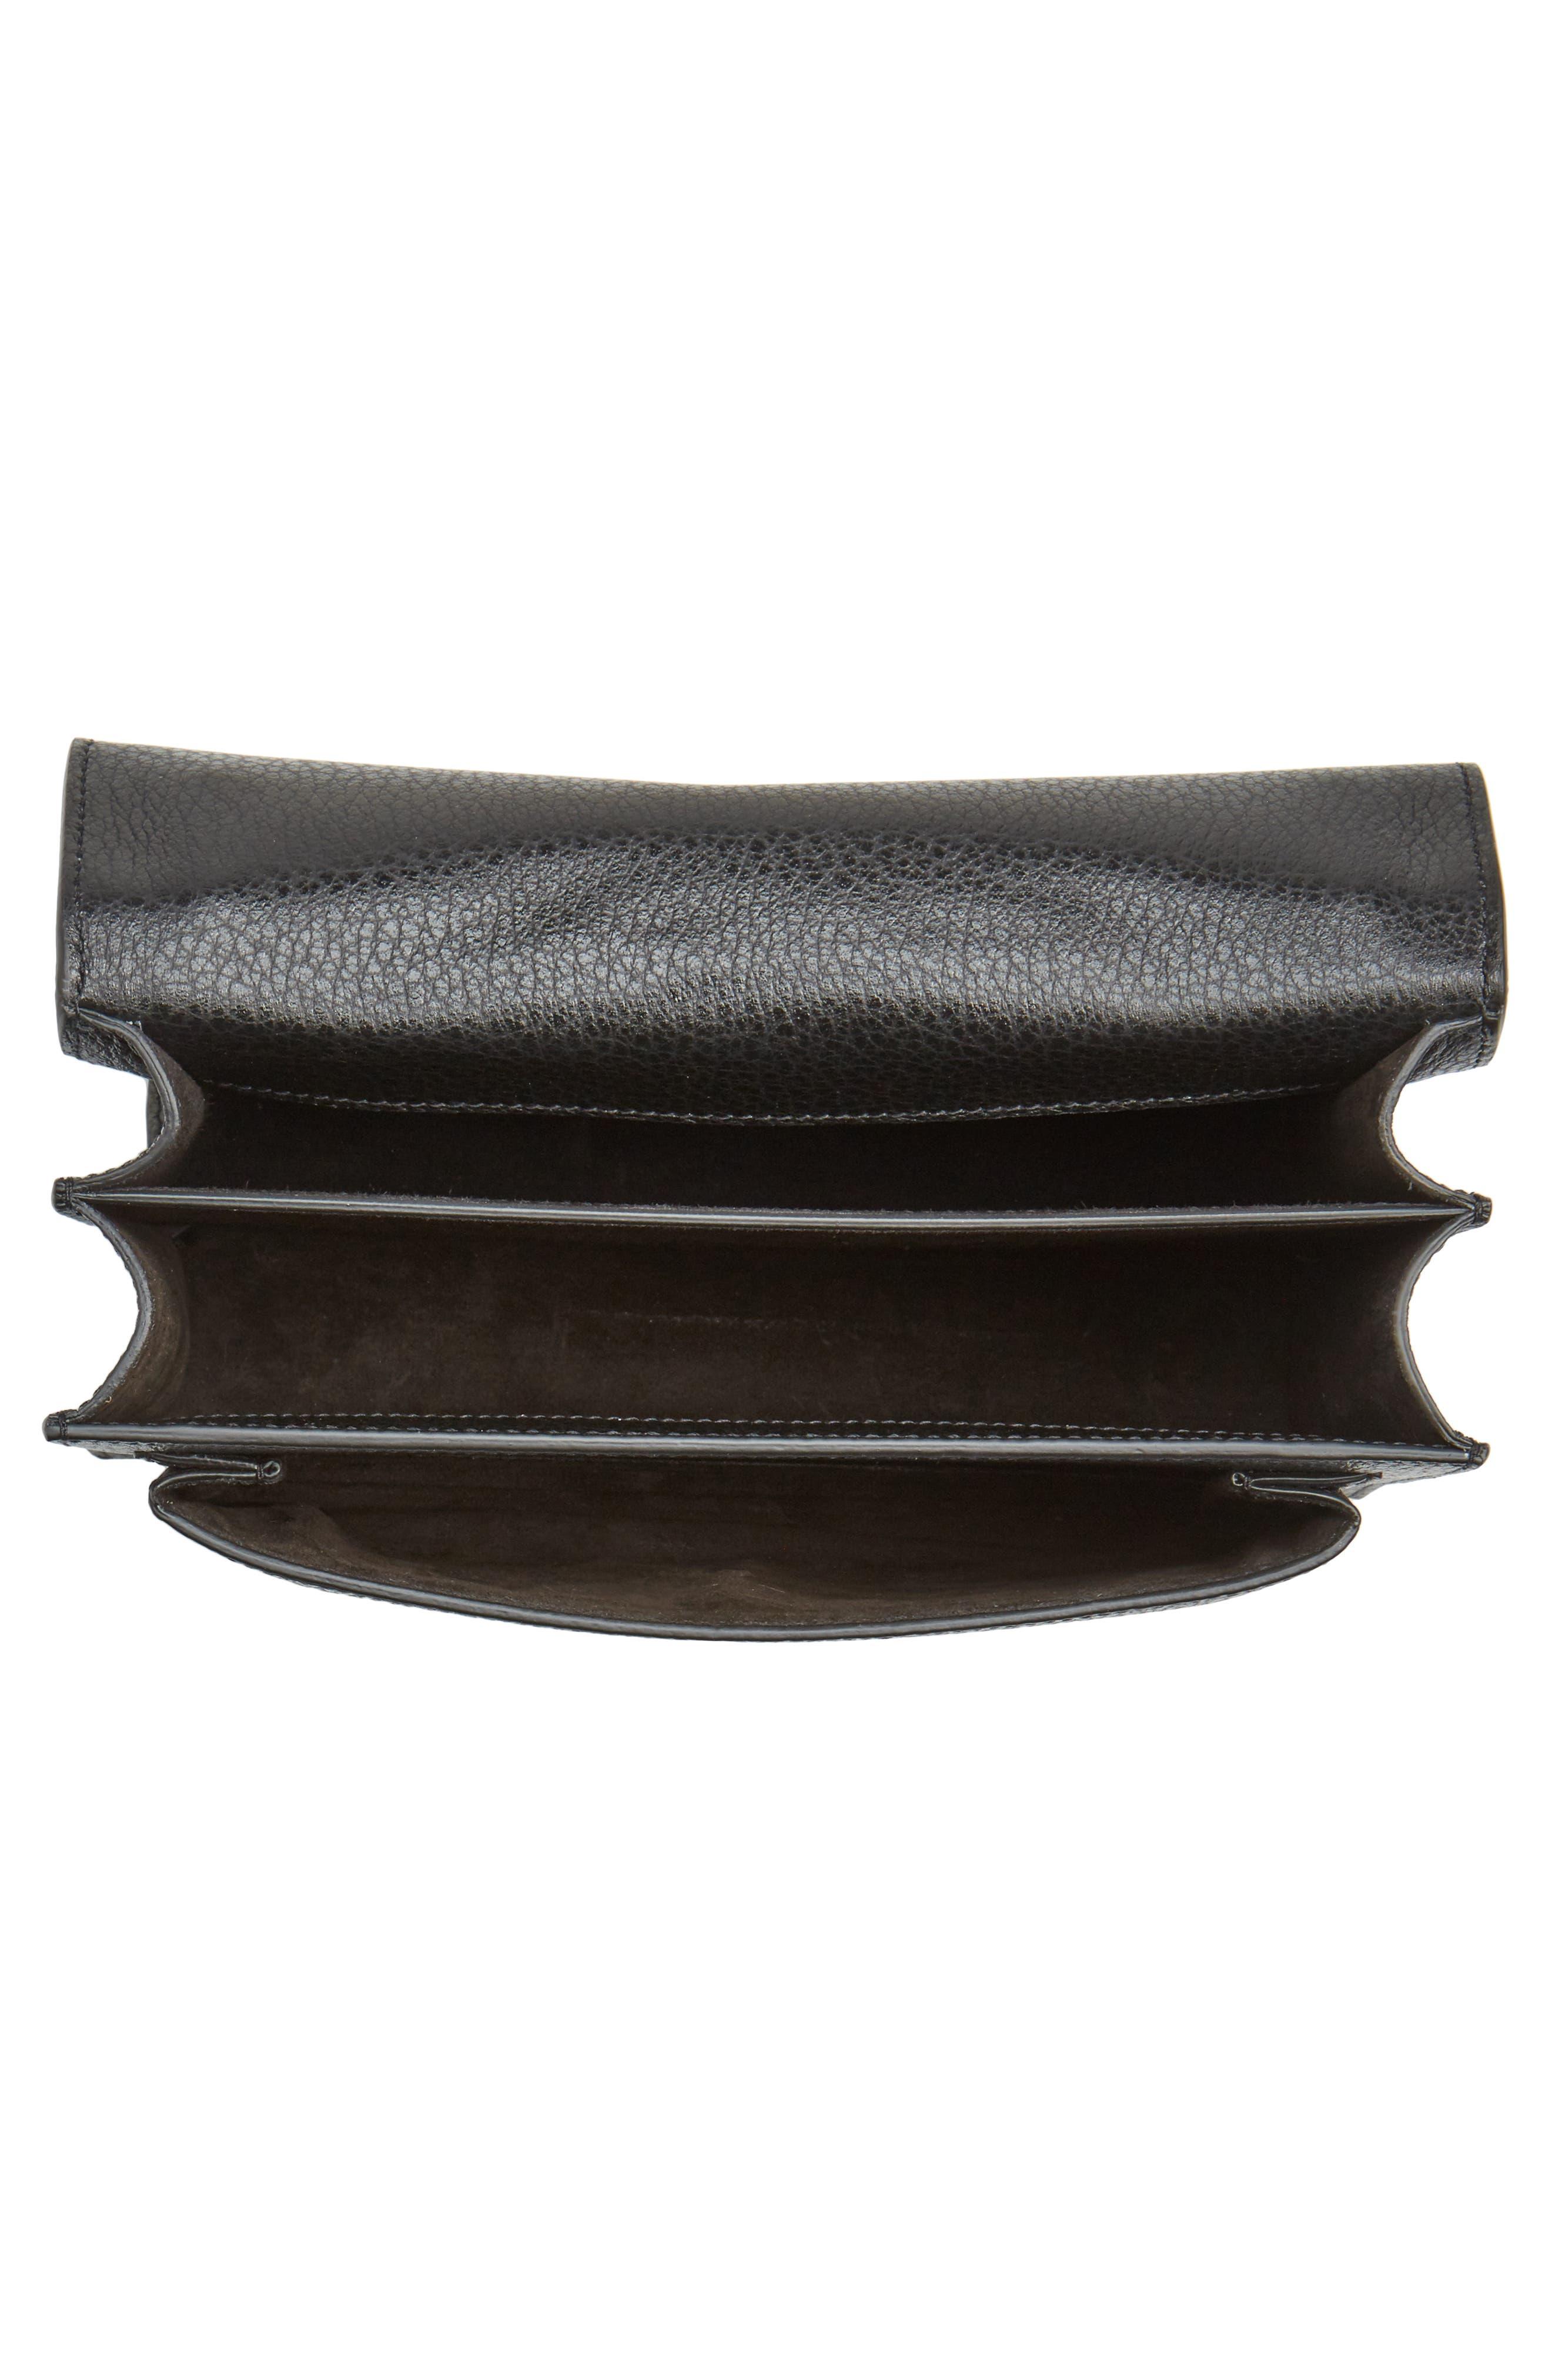 Medium Sunset Calfskin Shoulder Bag with Woven Guitar Strap,                             Alternate thumbnail 4, color,                             Noir